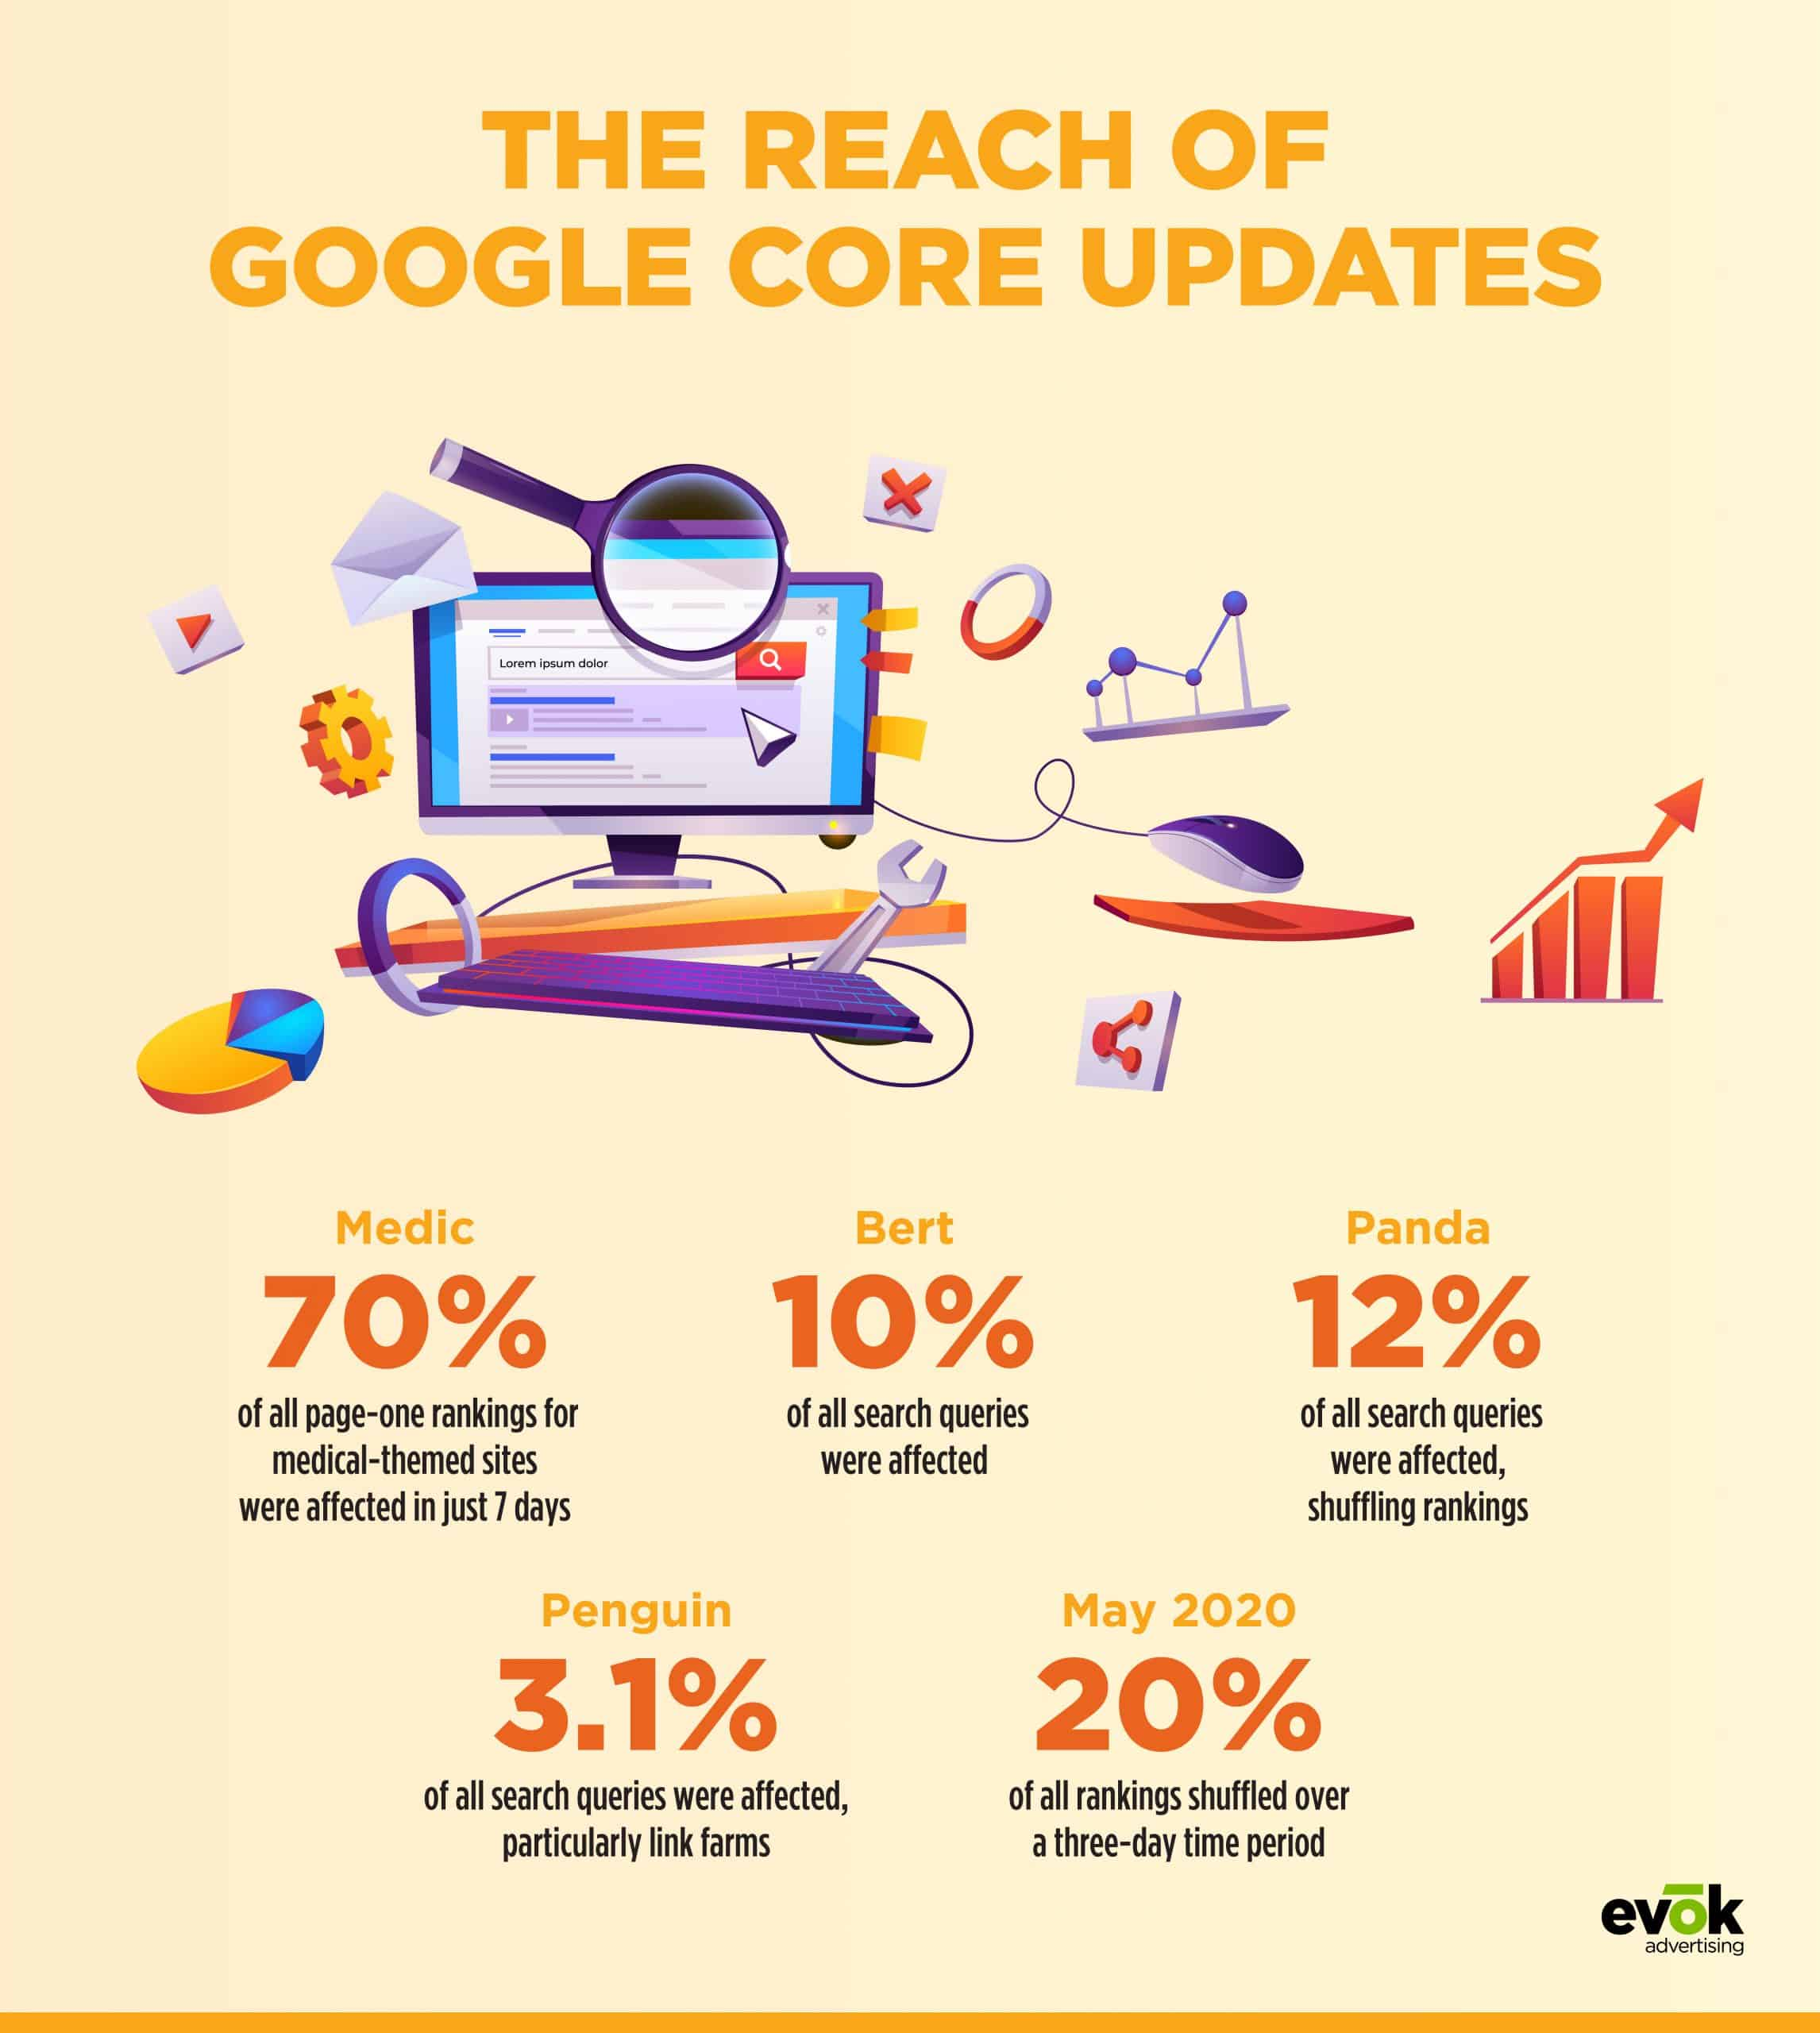 the reach of google core updates